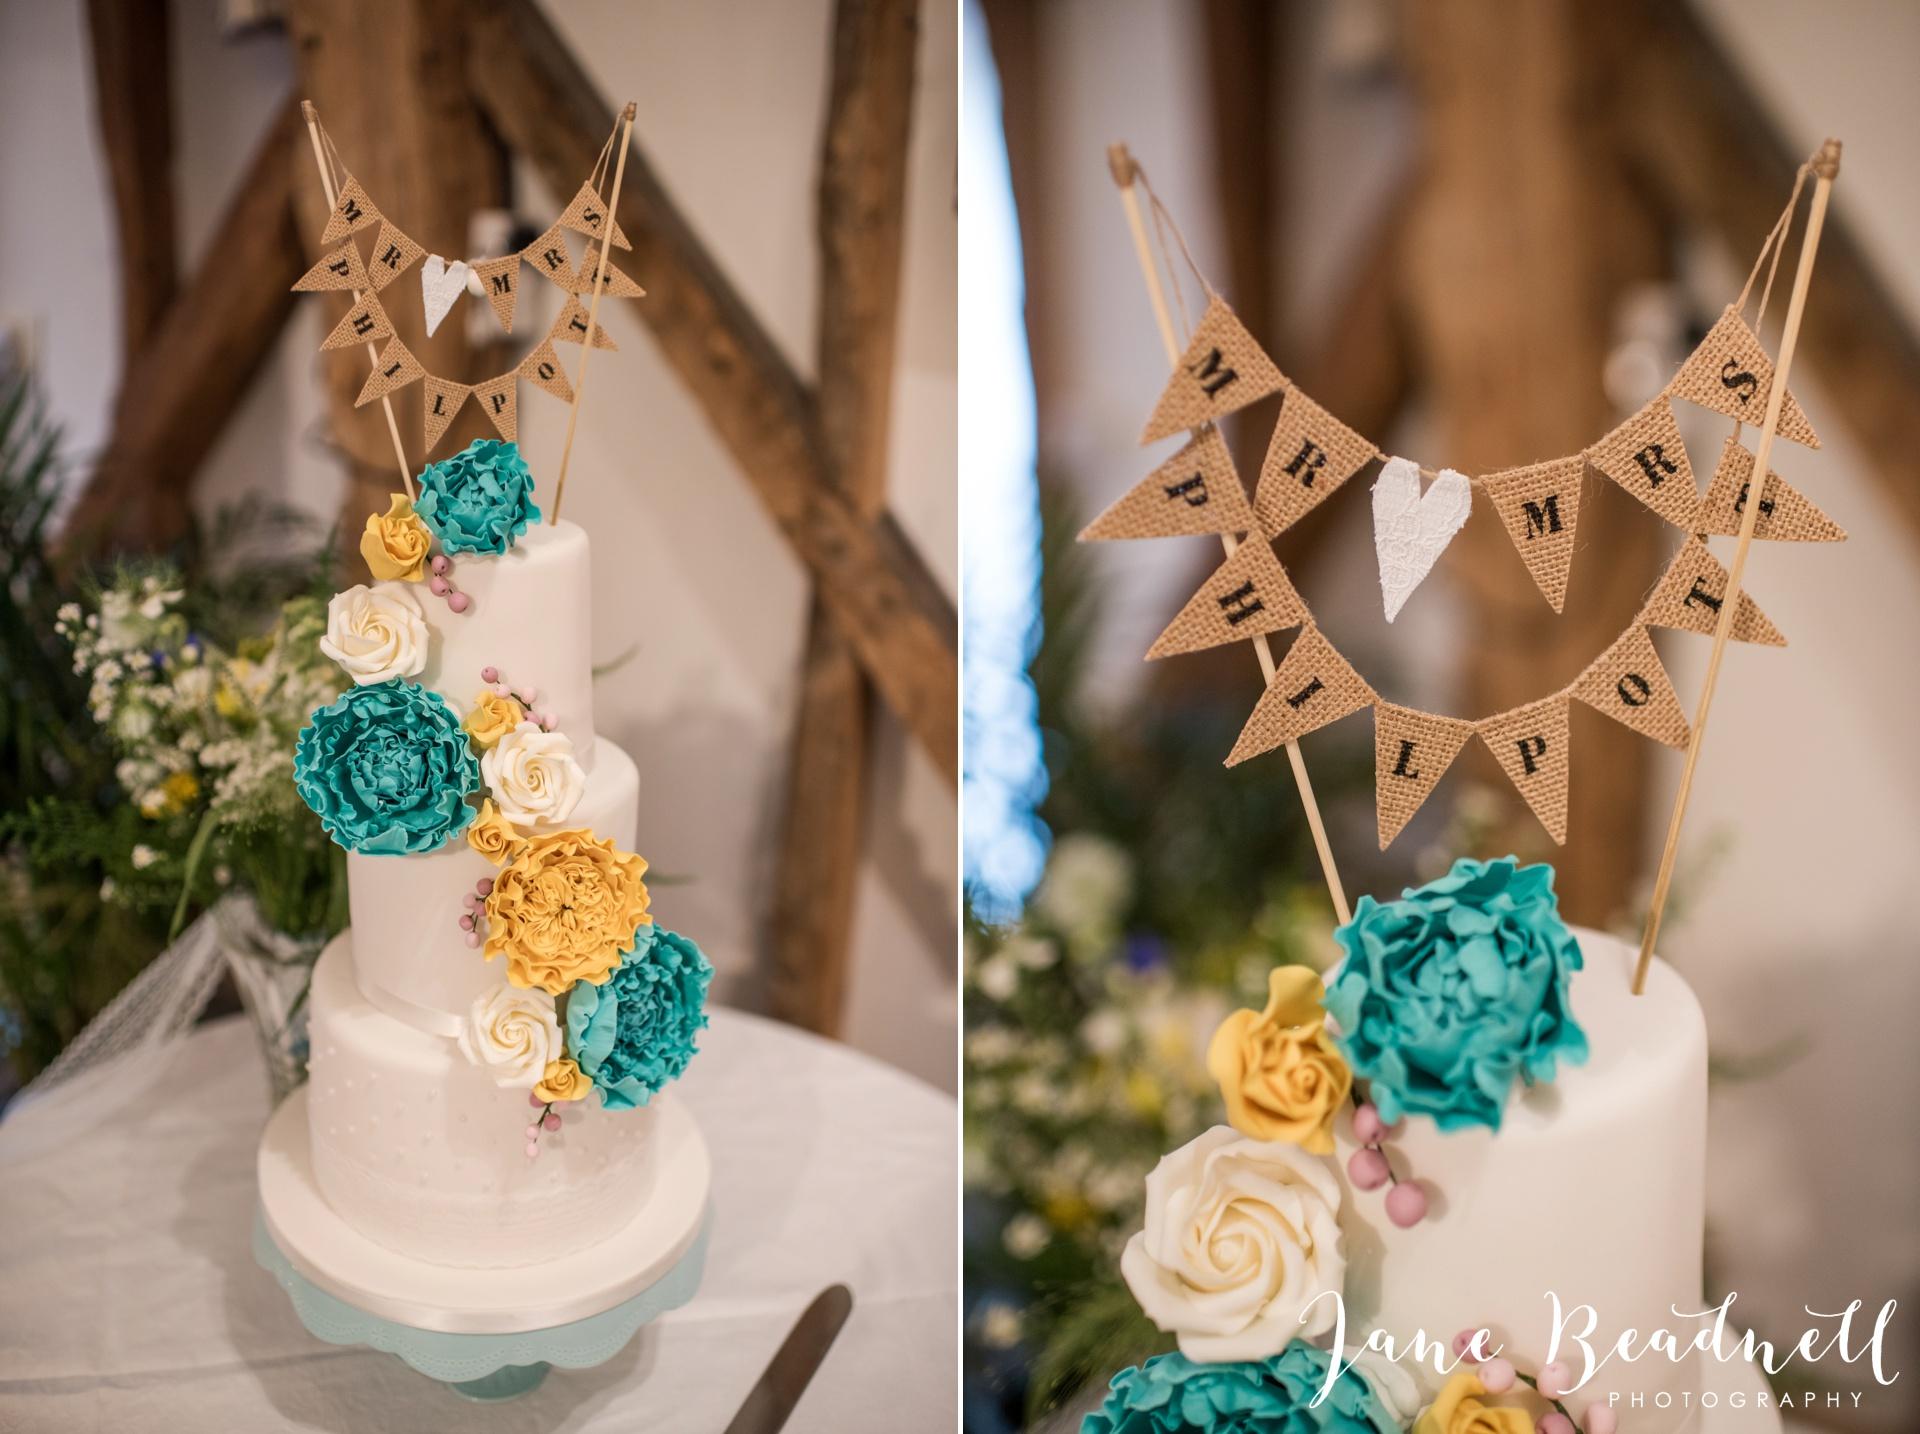 South Farm Wedding photography Hertfordshire by Jane Beadnell Photography fine art wedding photographer_0182